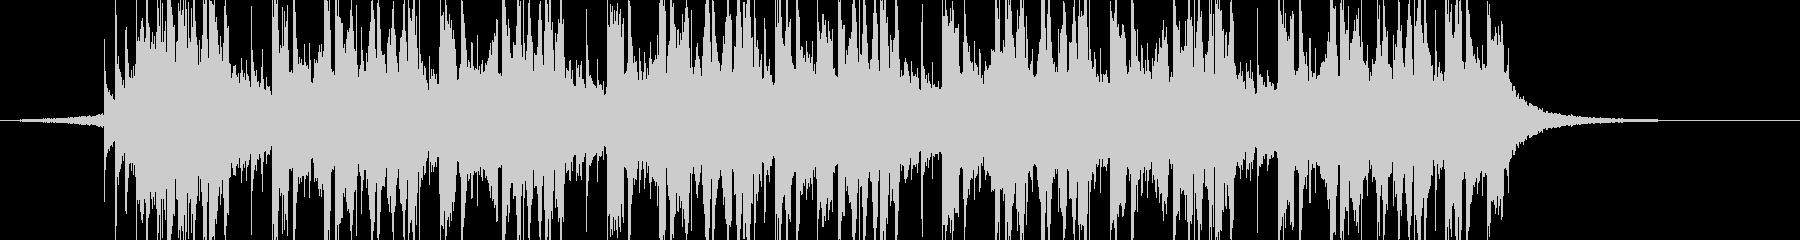 future bass、EDM1-Cの未再生の波形